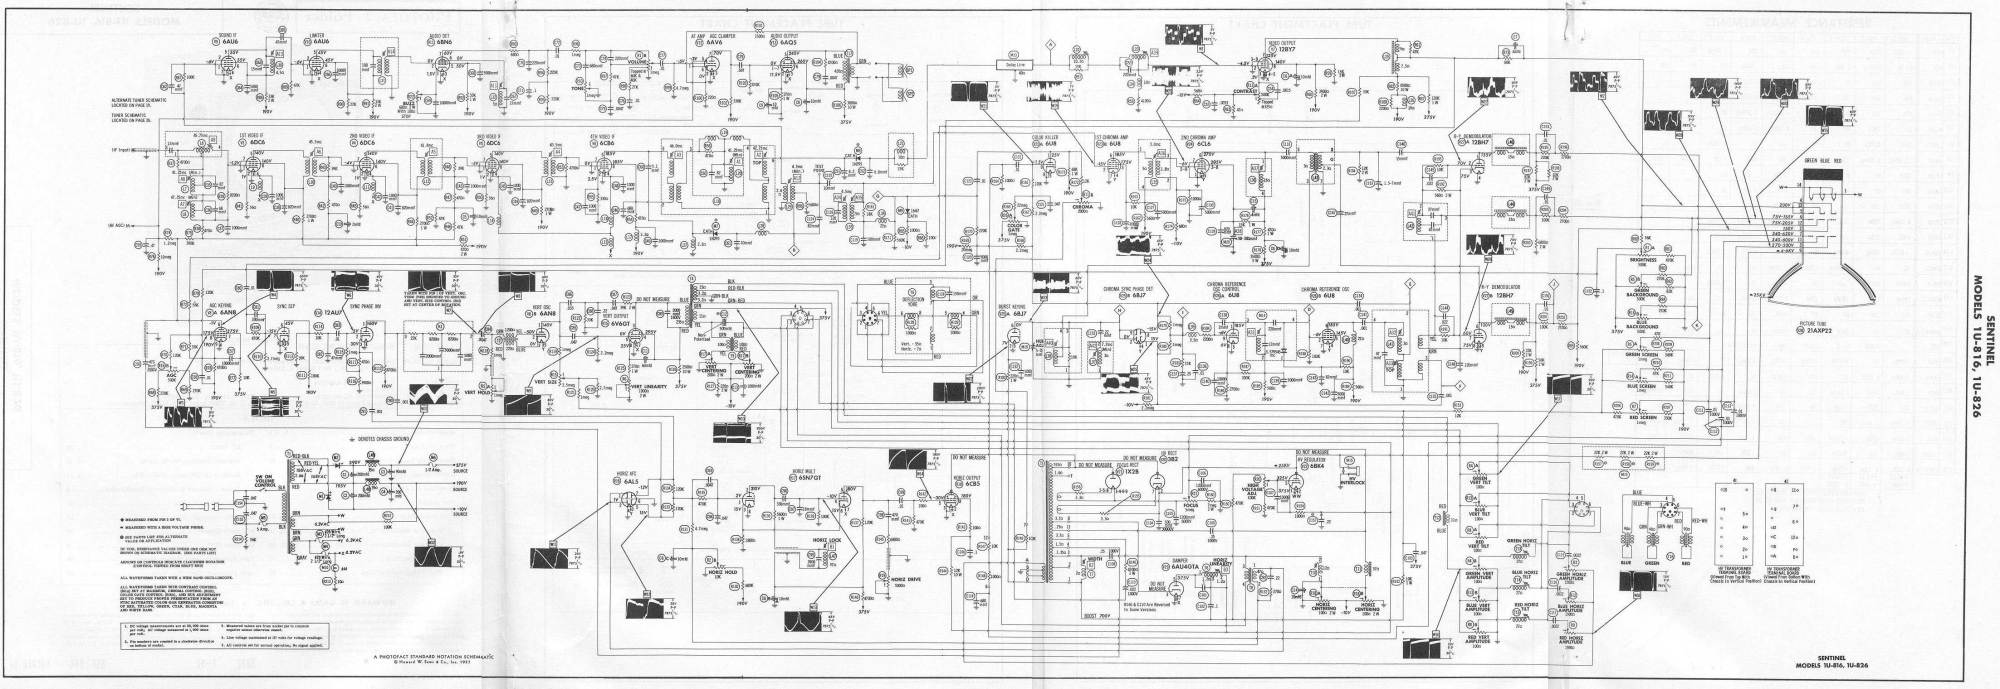 hight resolution of iu 816 schematic 35